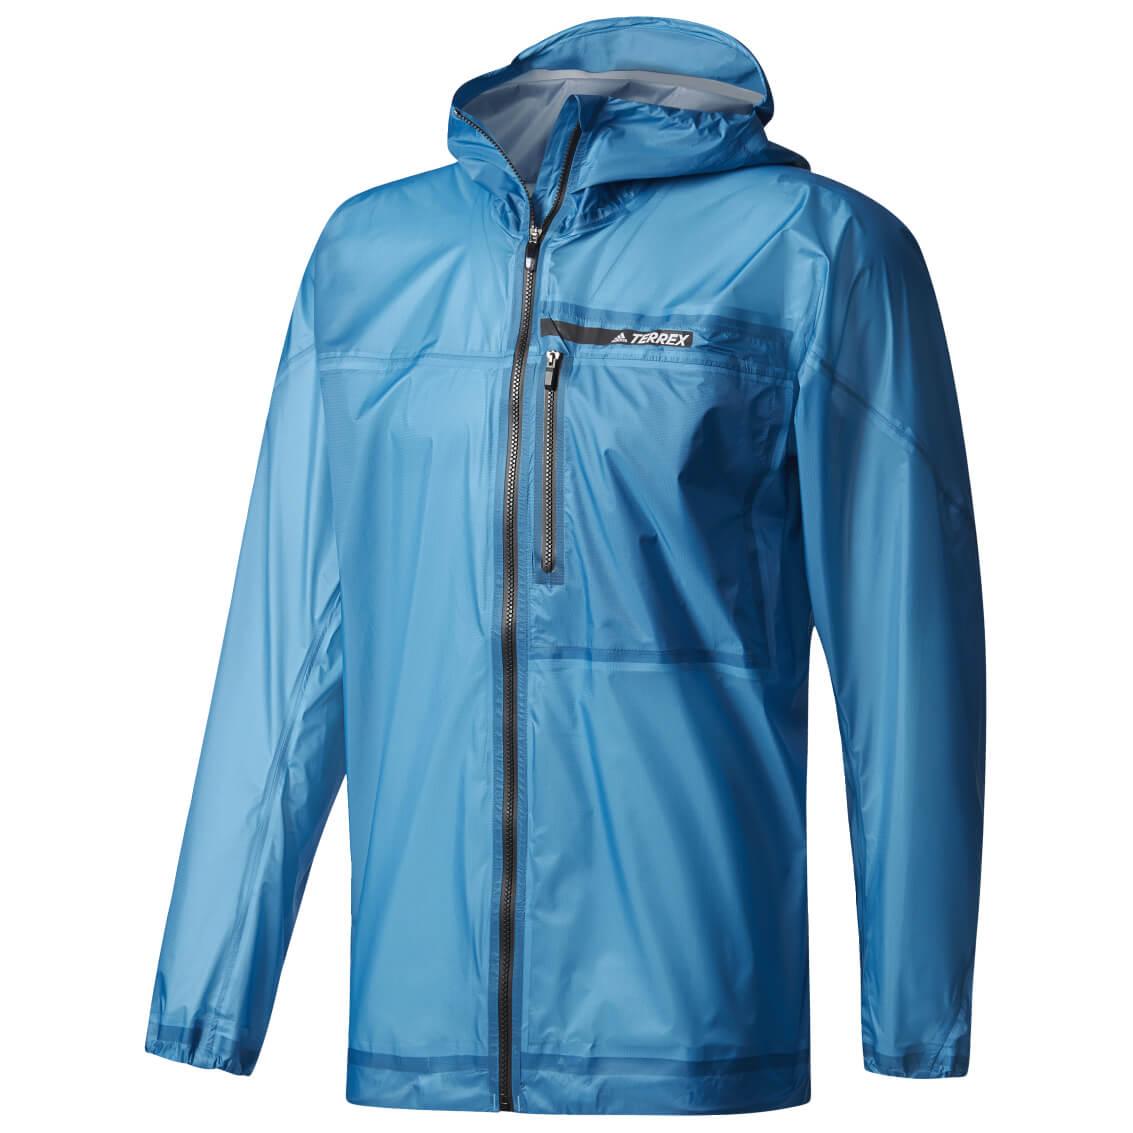 Adidas Terrex Agravic 3L Jacket Hardshelljacke Herren